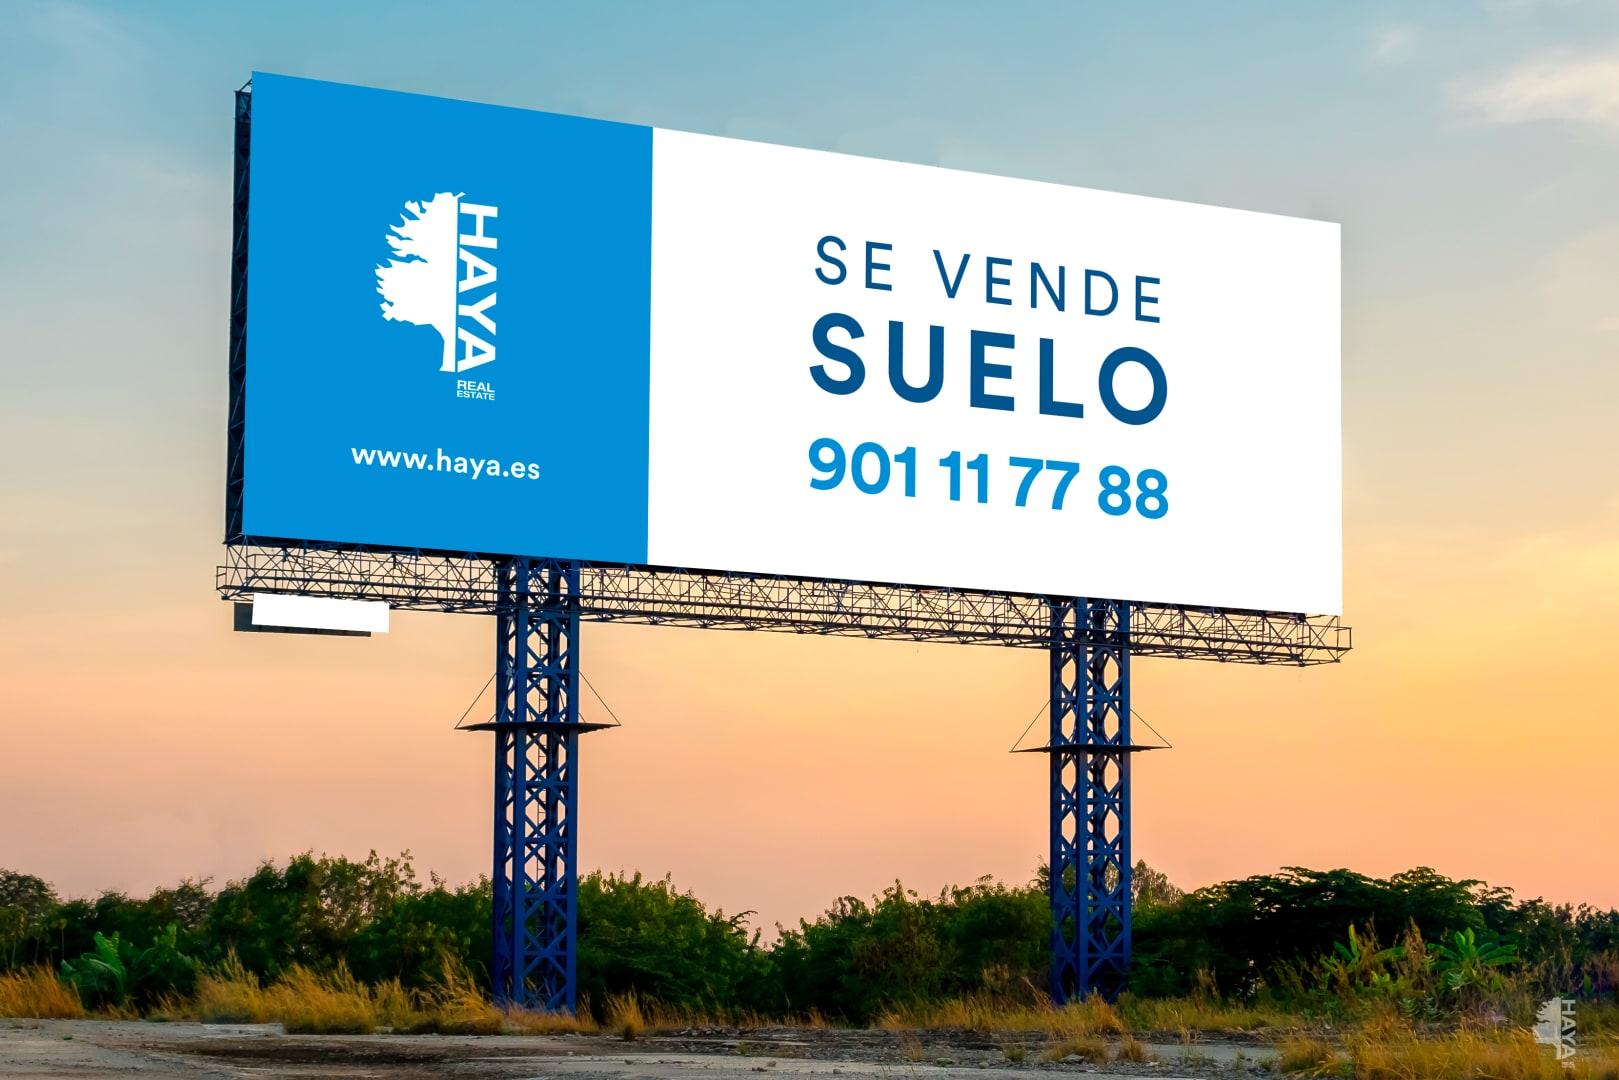 Suelo en venta en Vélez-rubio, Almería, Calle Polígono, 2.220.000 €, 1763444 m2